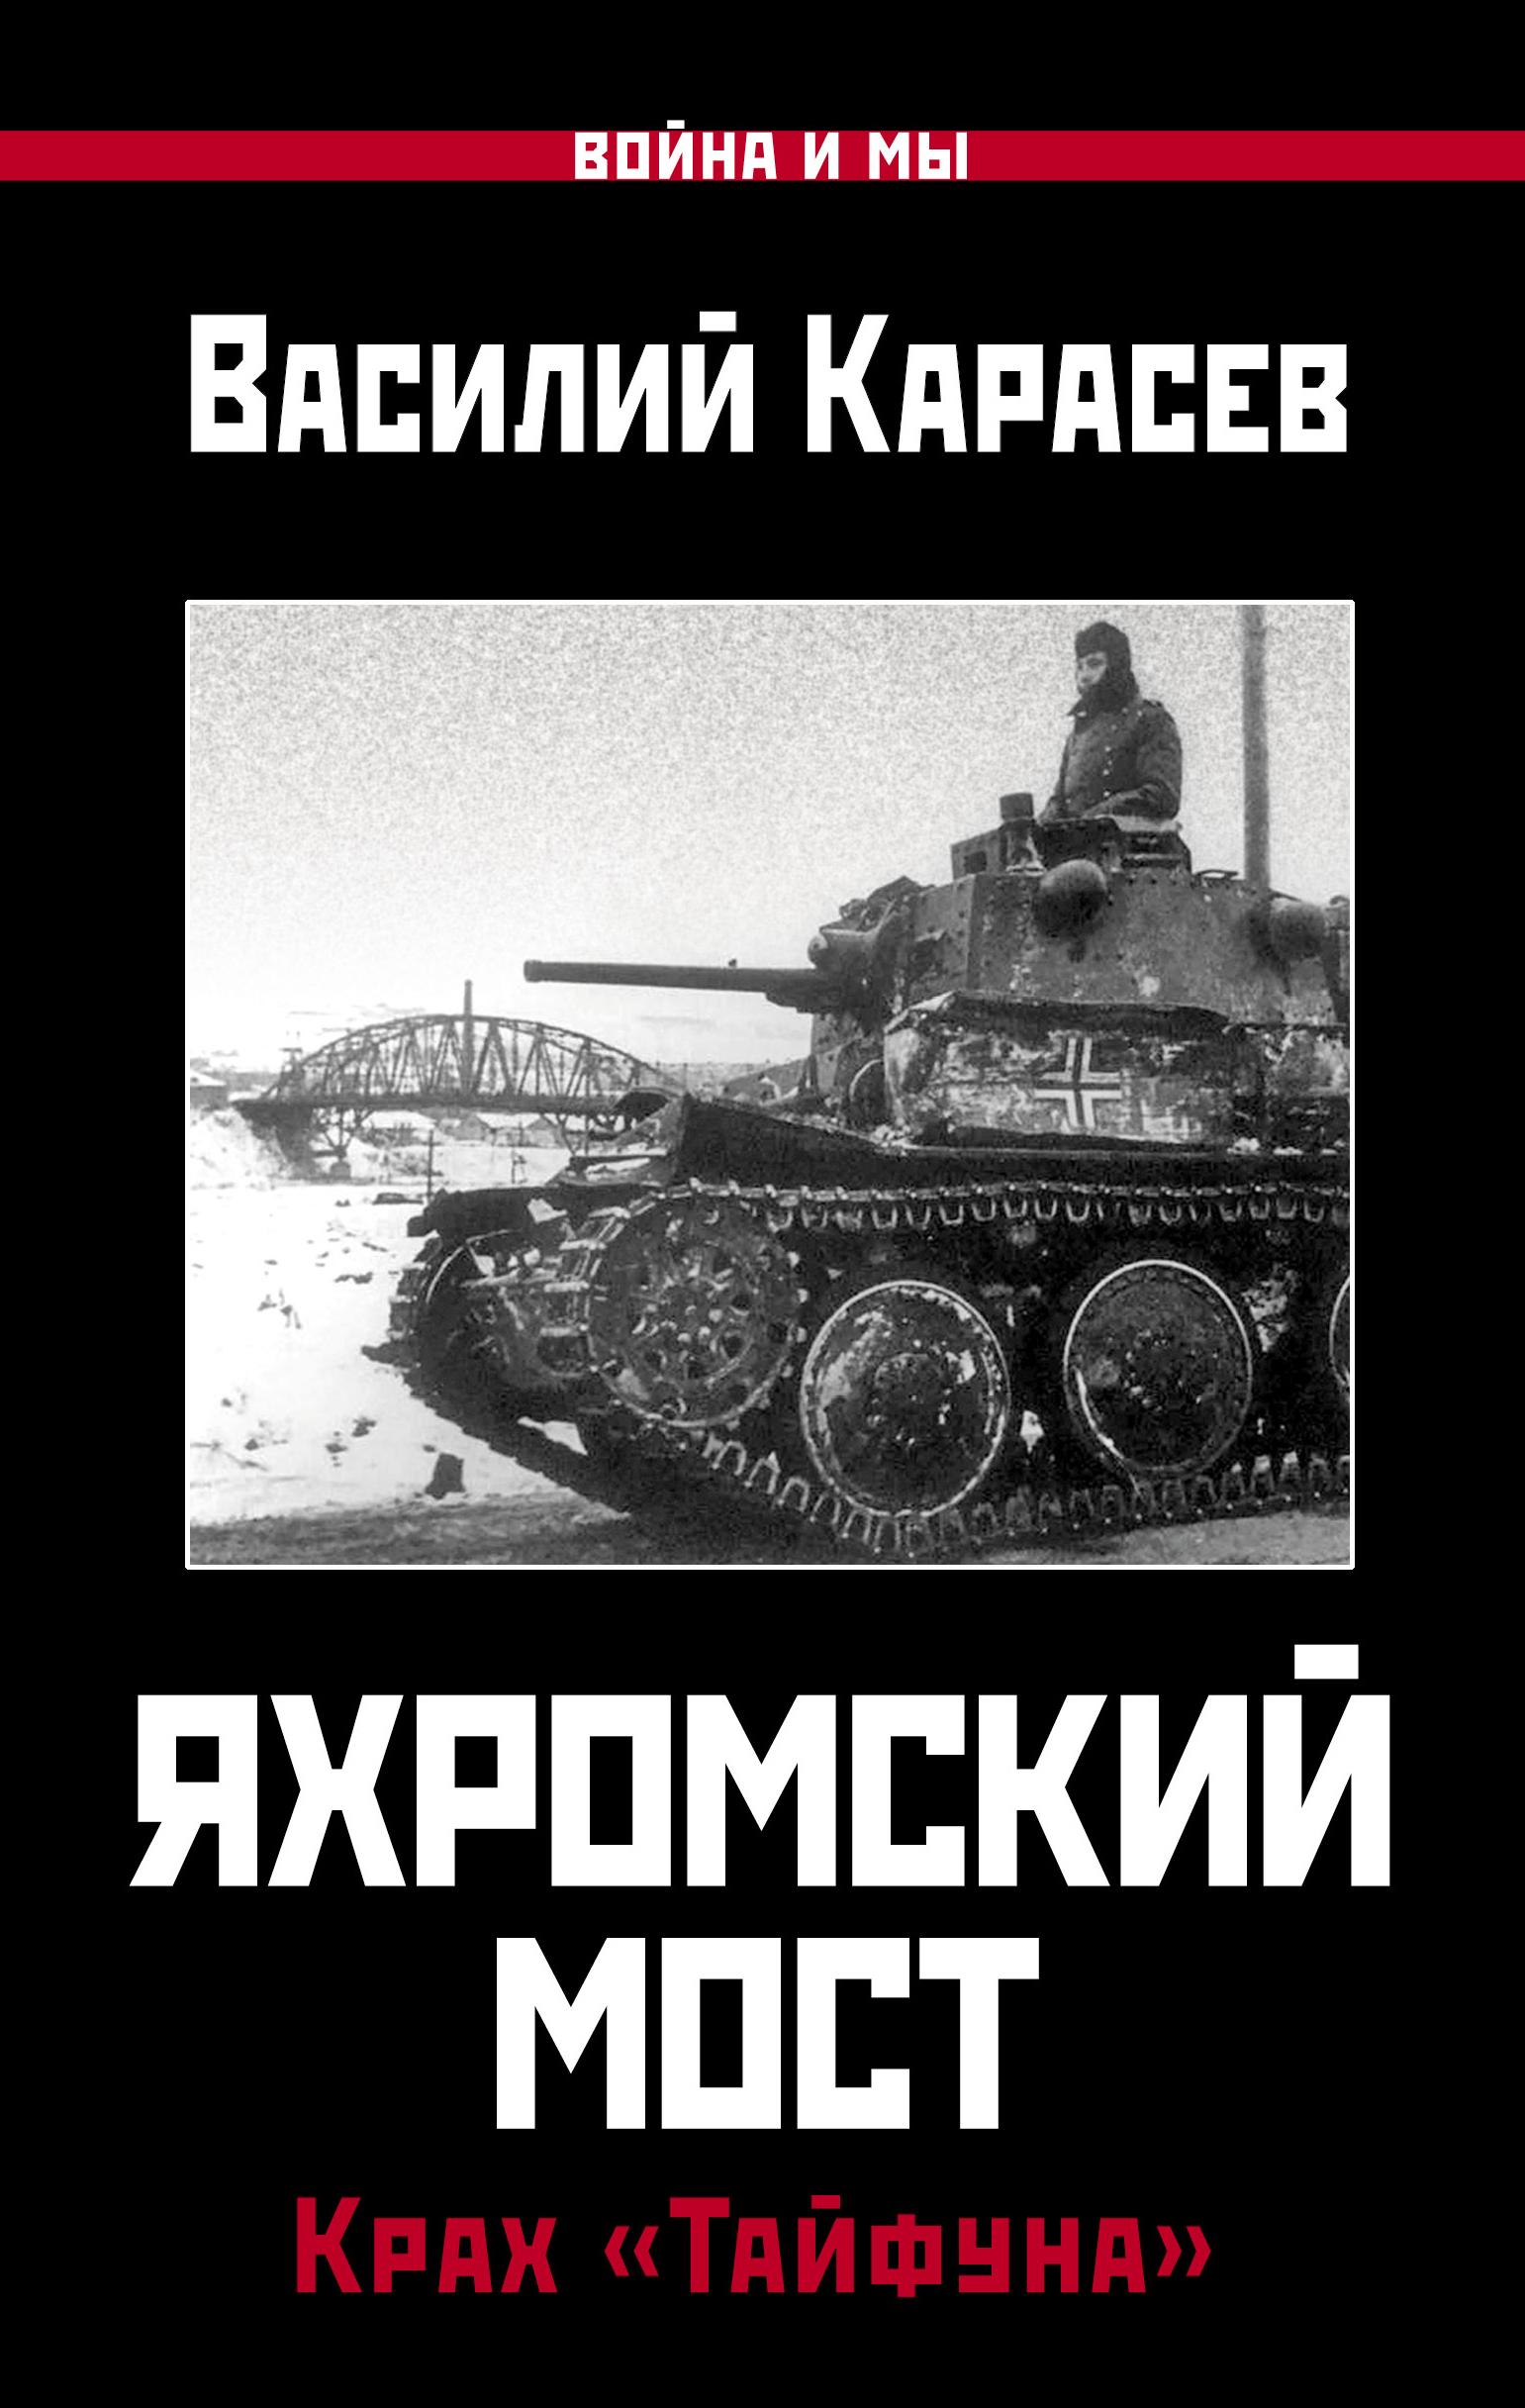 Купить книгу Яхромский мост: Крах «Тайфуна», автора Василия Карасева